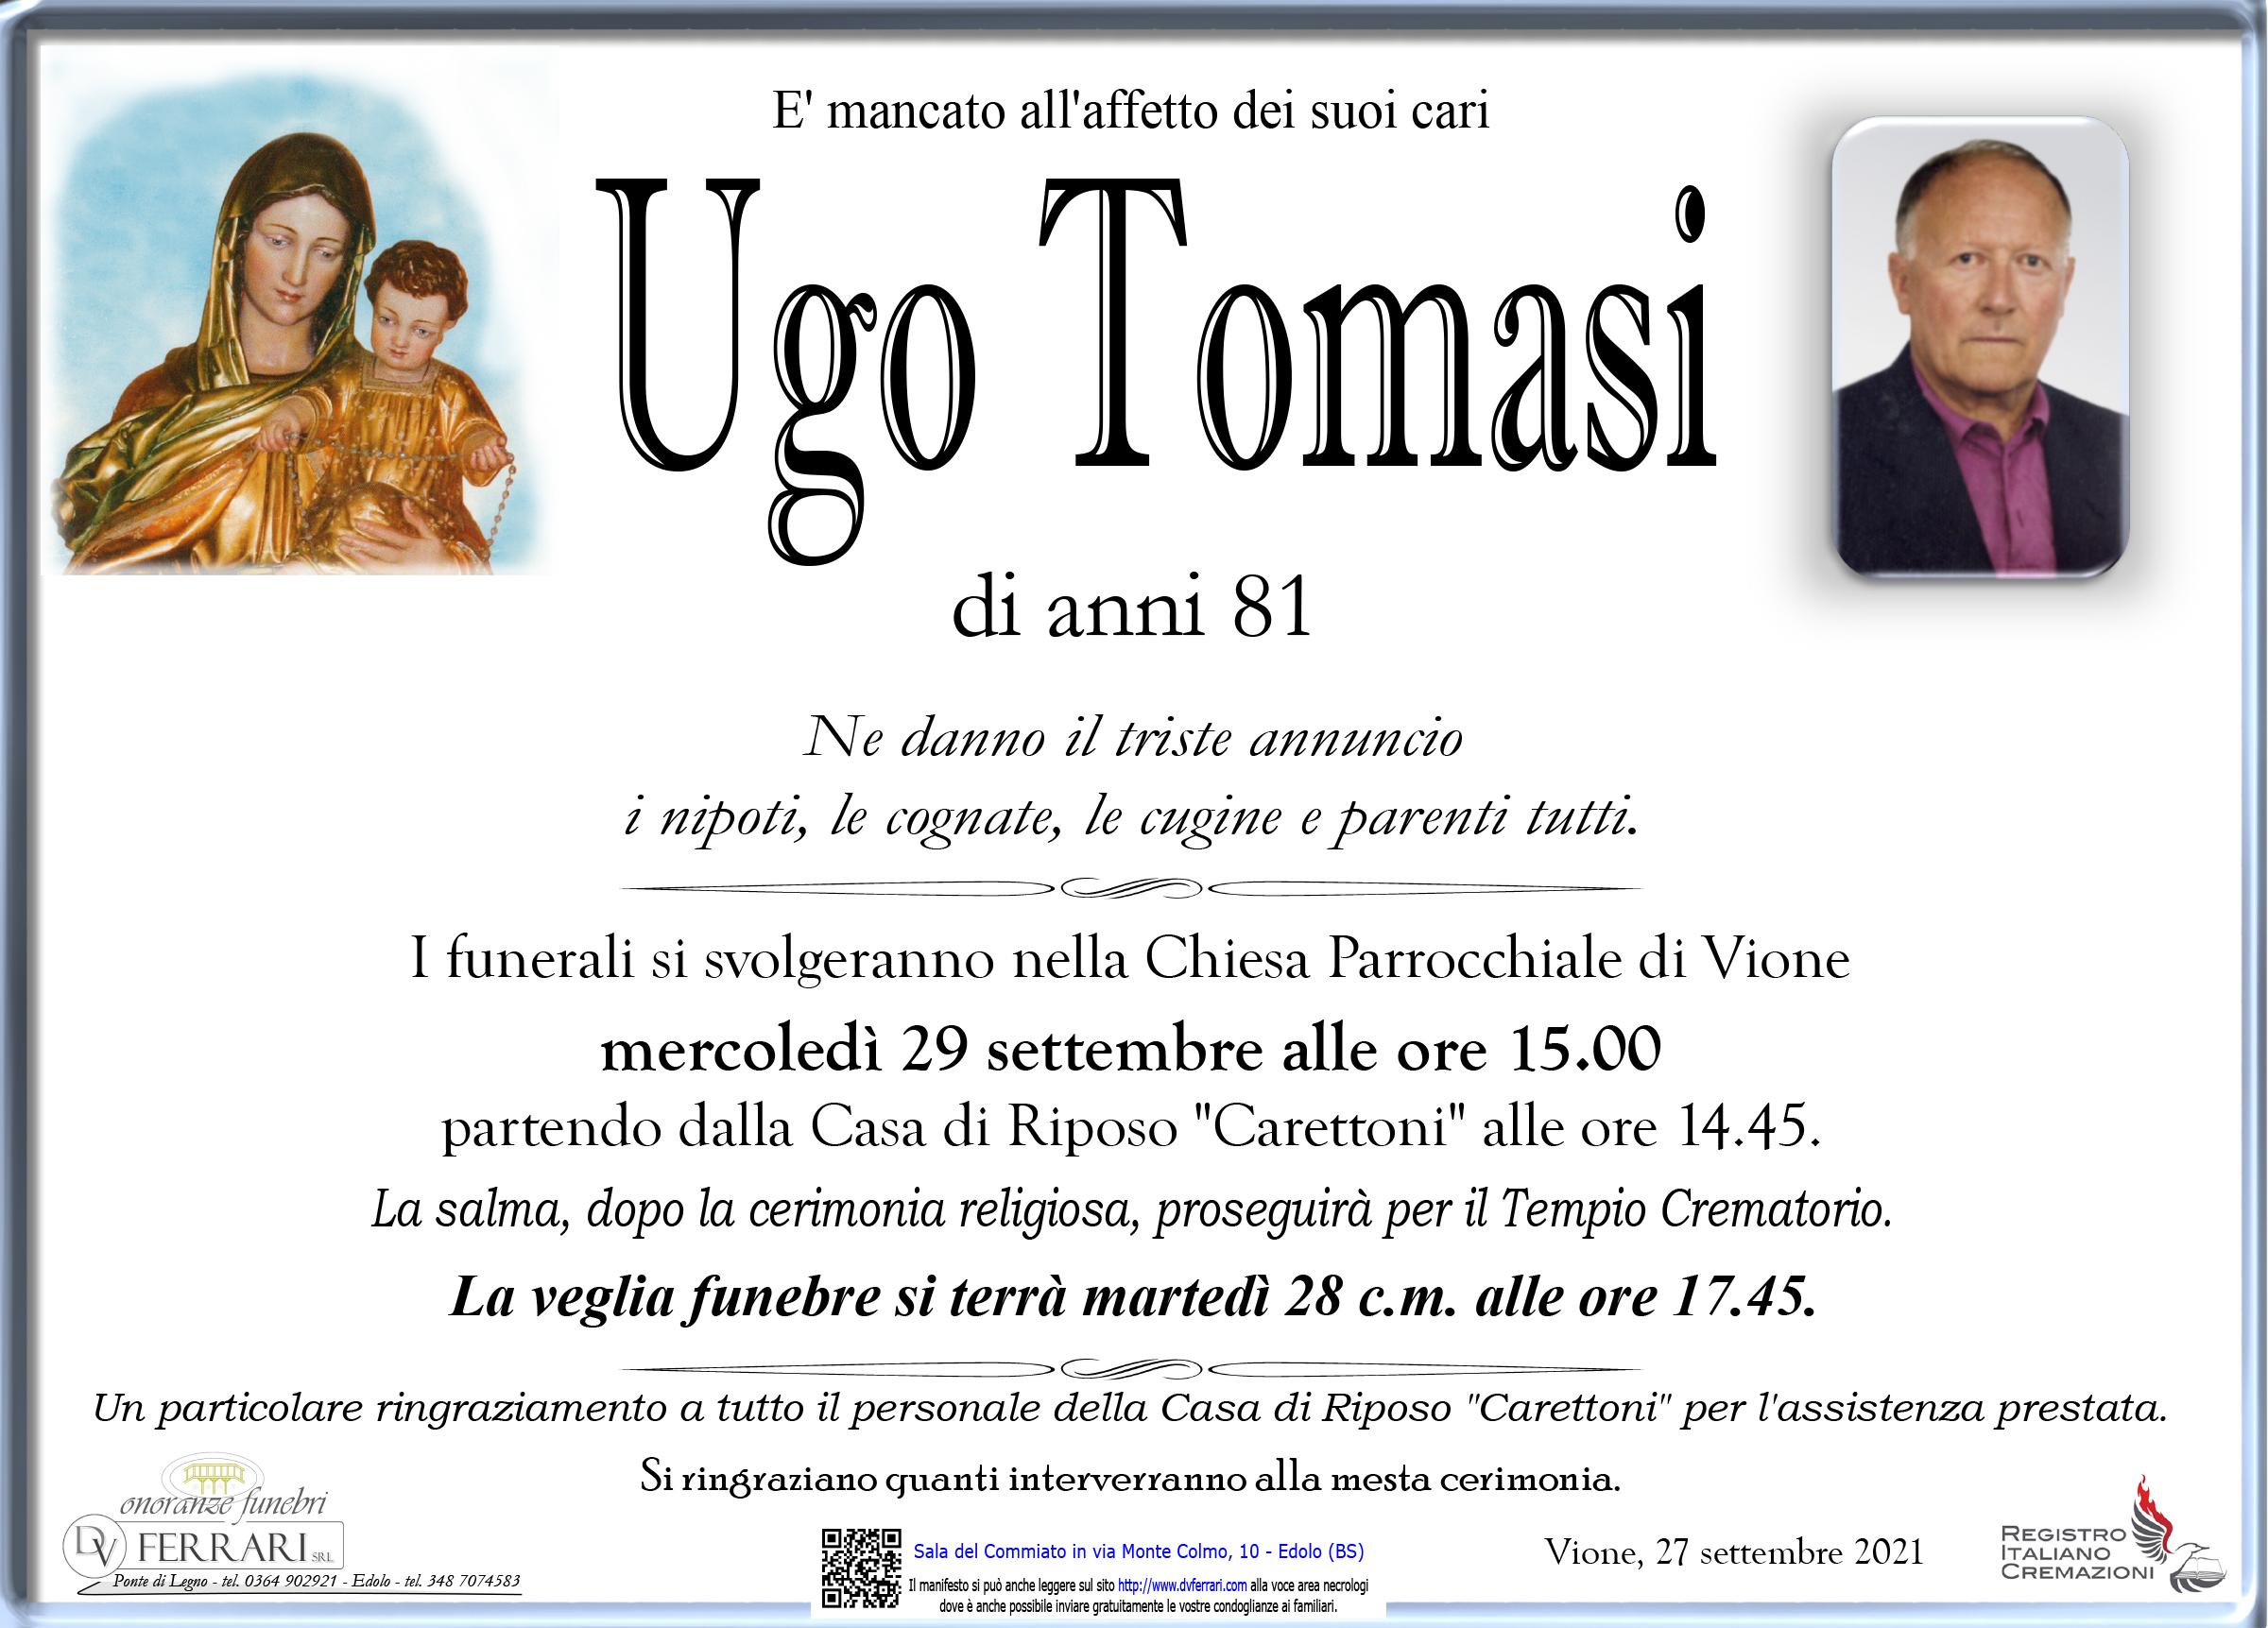 UGO GIUSEPPE TOMASI - VIONE